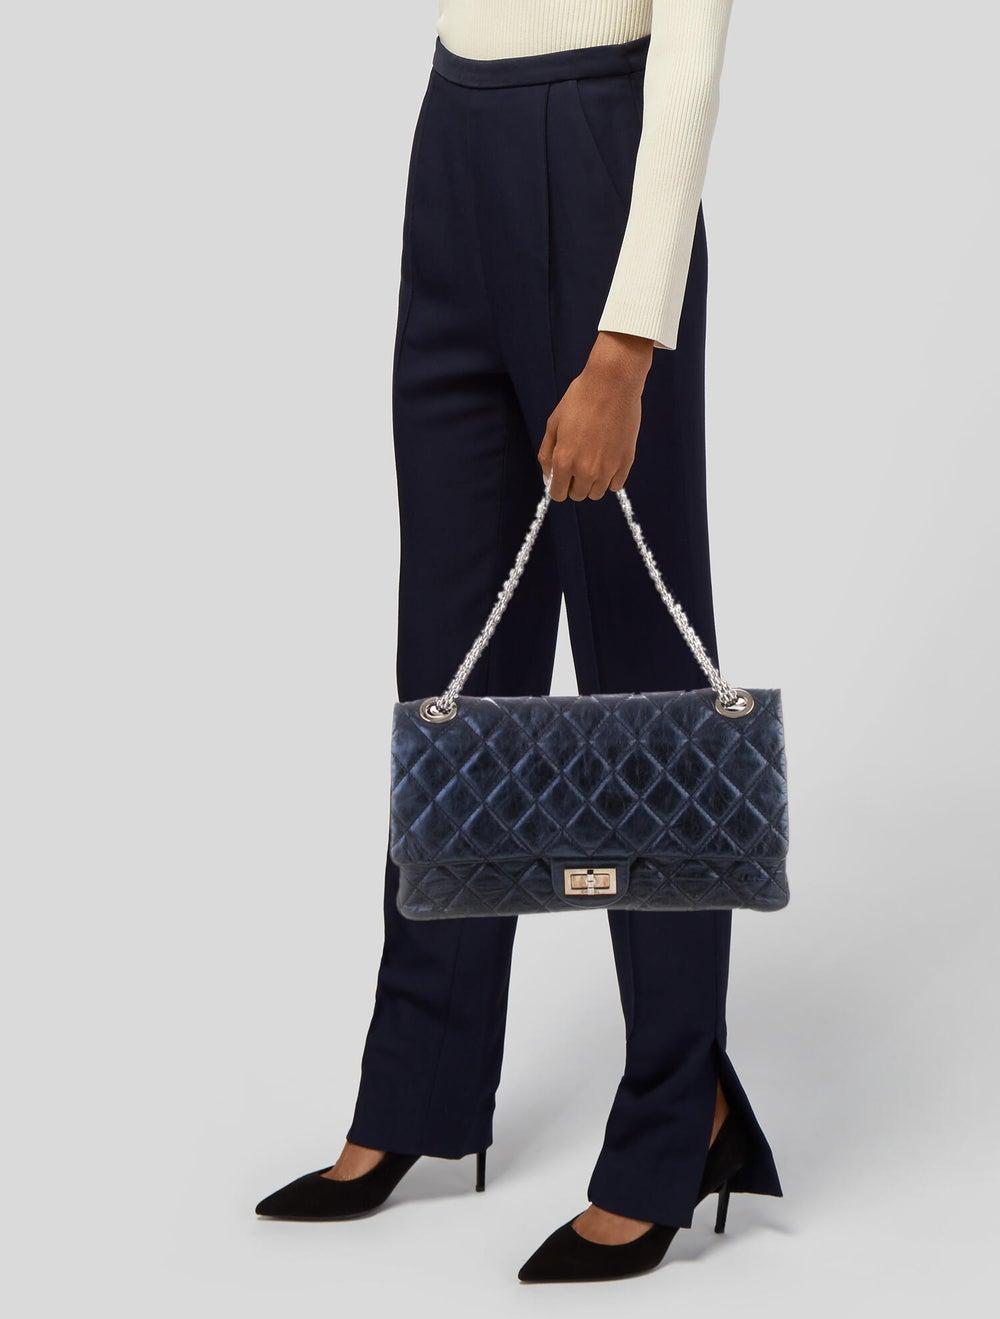 Chanel Reissue 2.55 Classic 227 Flap Bag Blue - image 2